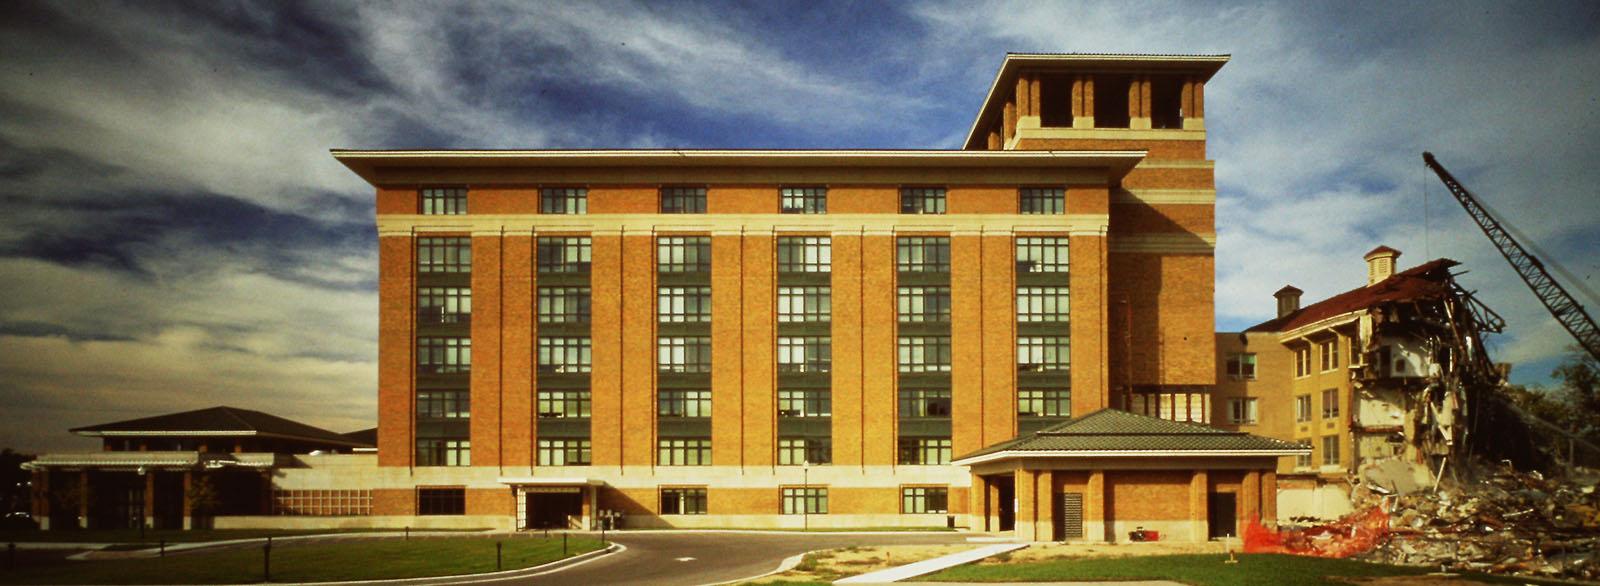 Columbus Regional Hospital remodel showing demolition of original 1917 building